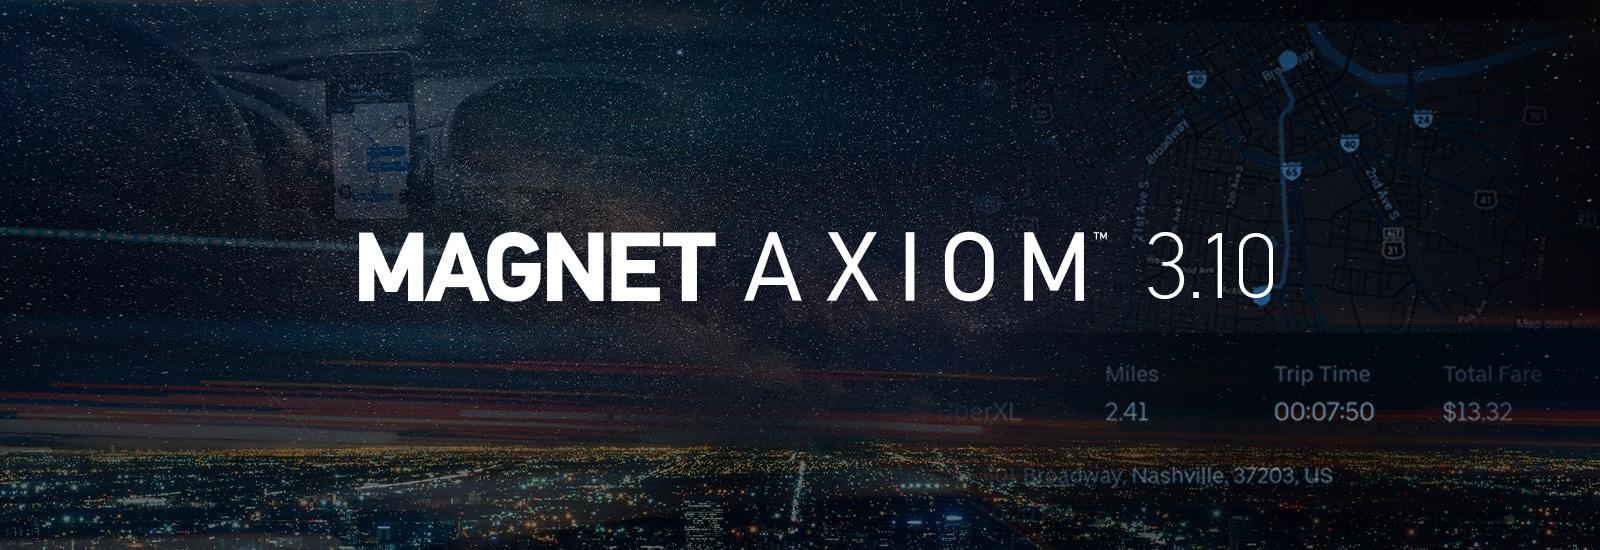 Magnet AXIOM 3.10